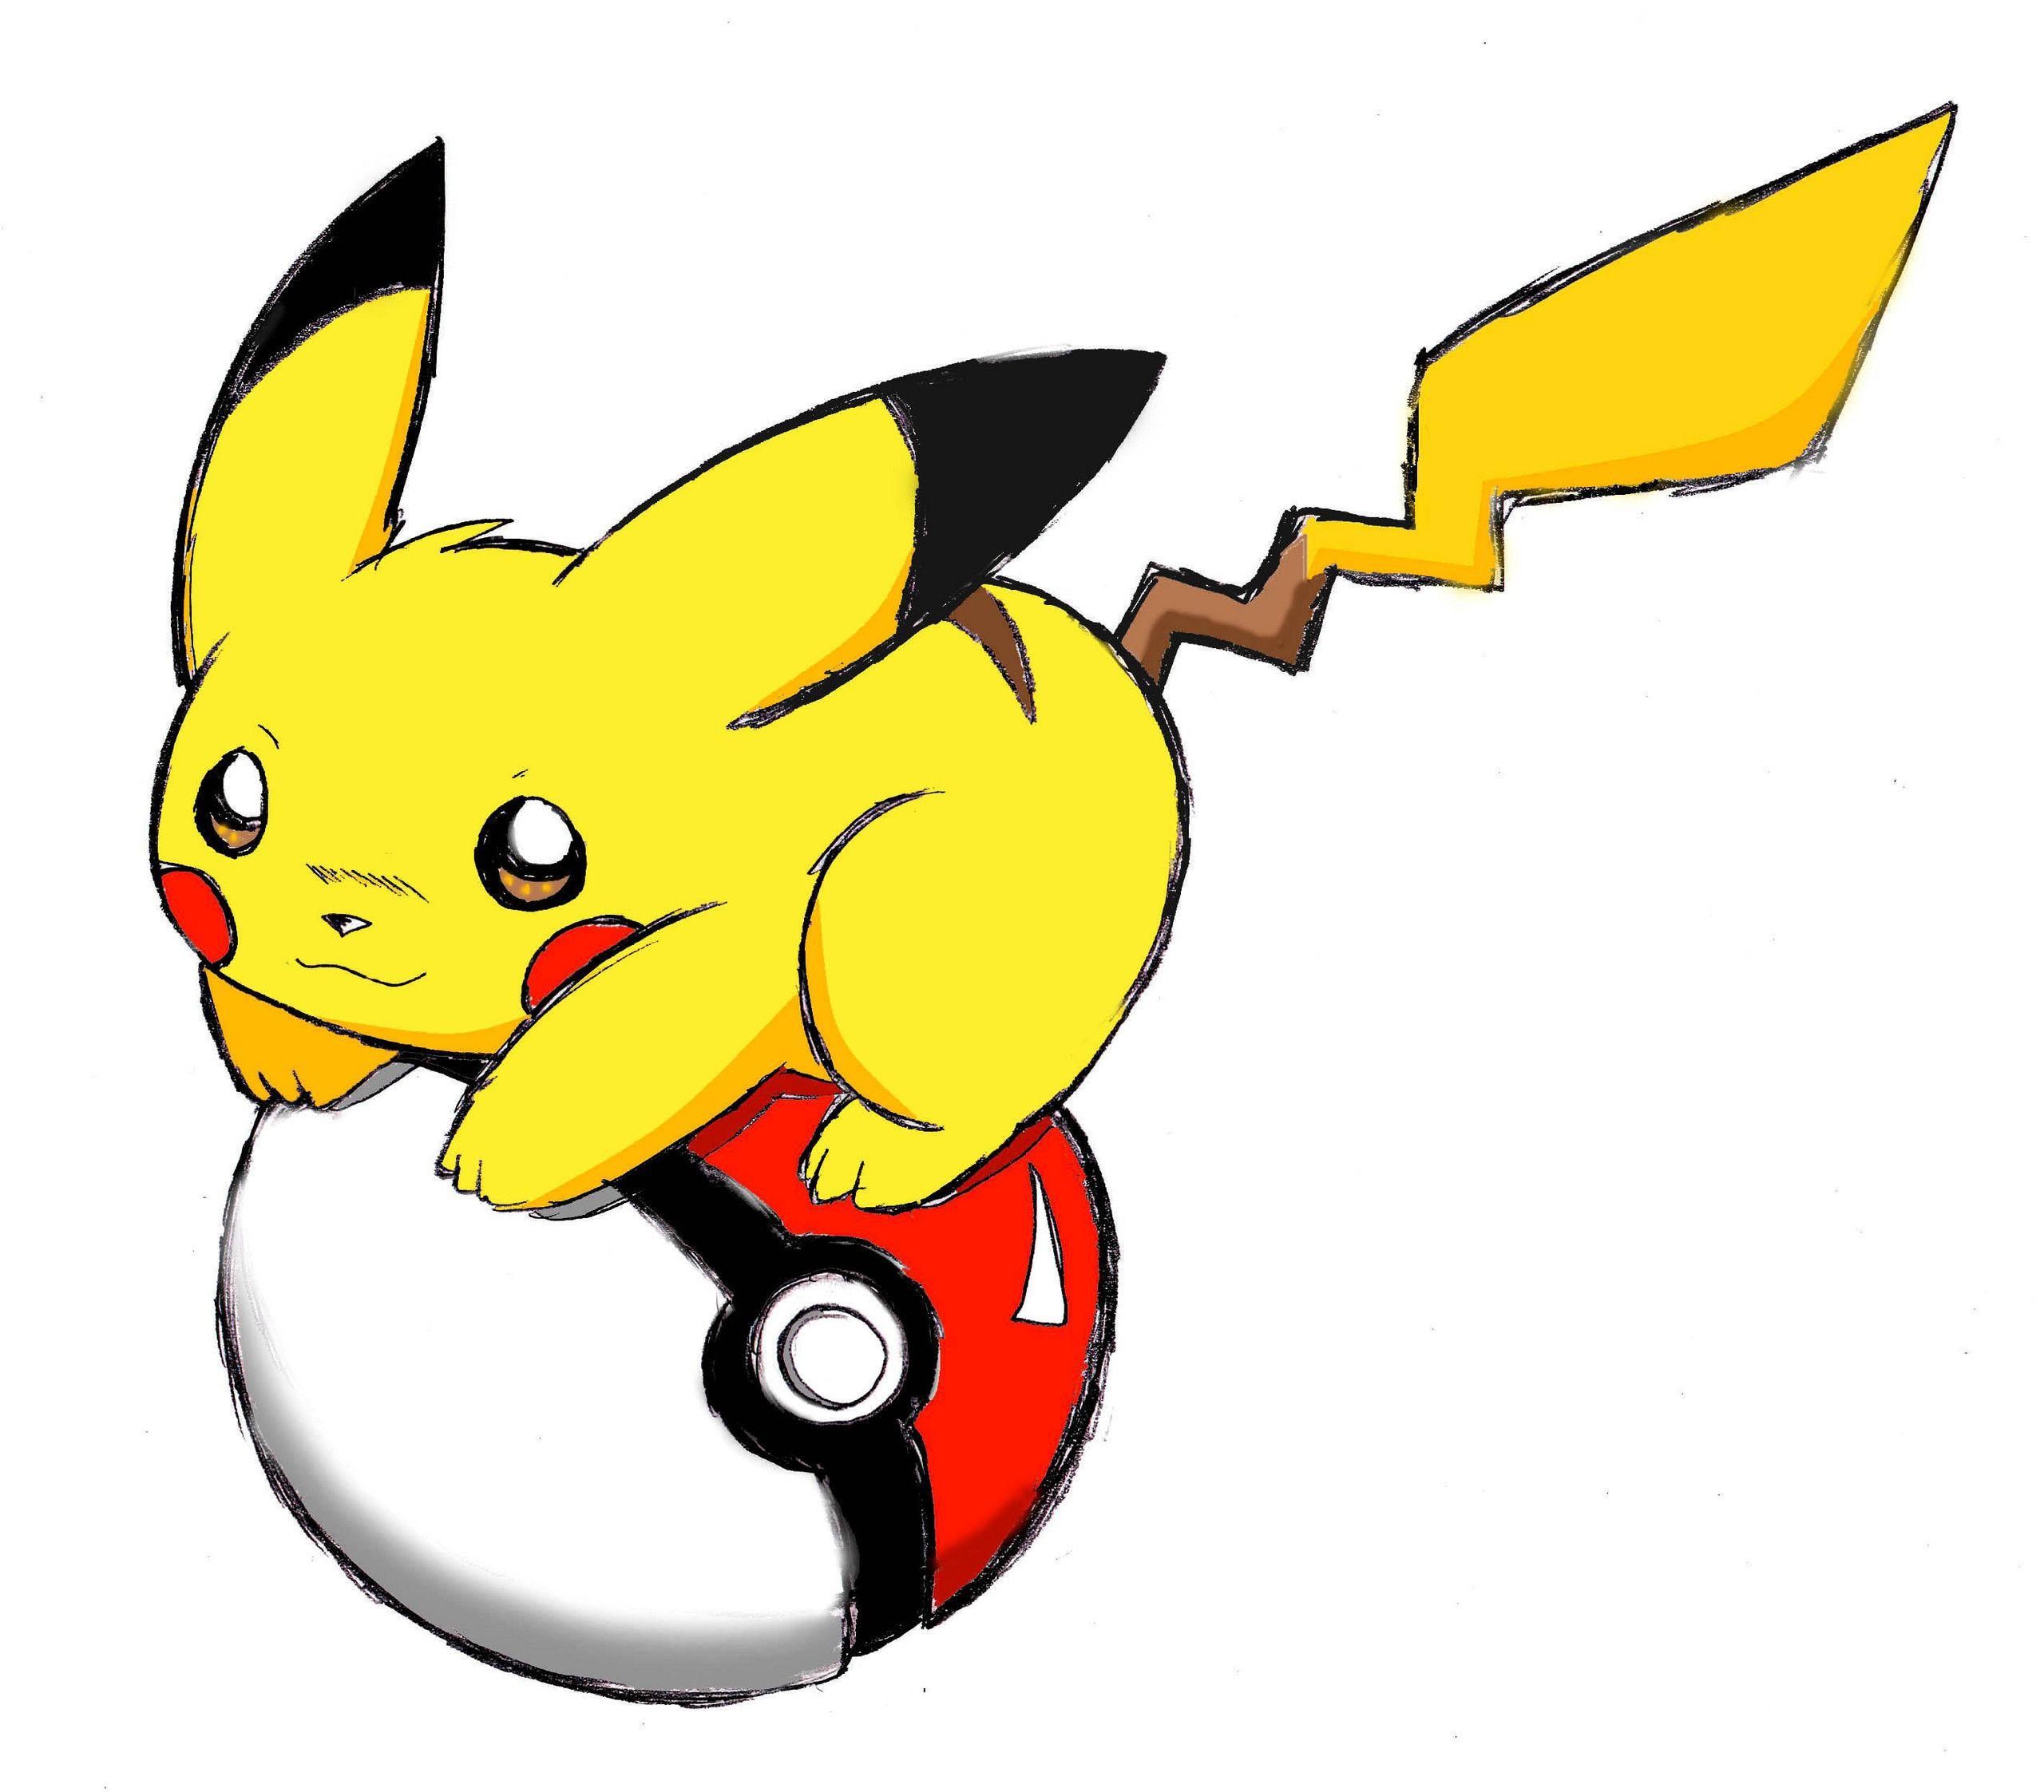 Pikachu With Pokeball Pika Pika Chu Pikachu